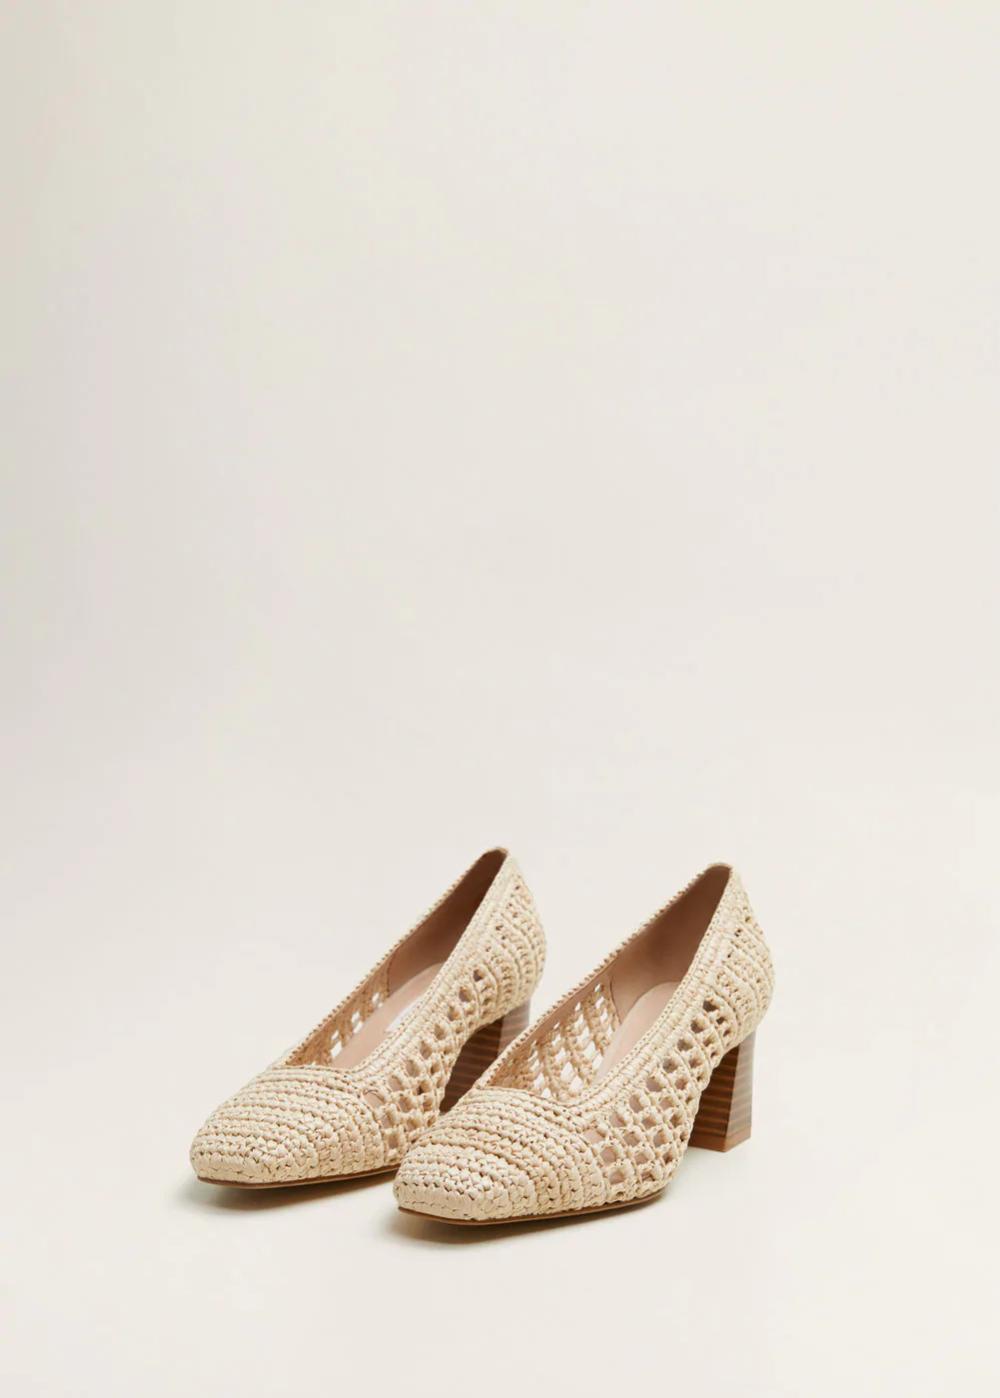 Plecione Buty Na Obcasie Kobieta Mango Polska Shoes Heels Heels Women Shoes